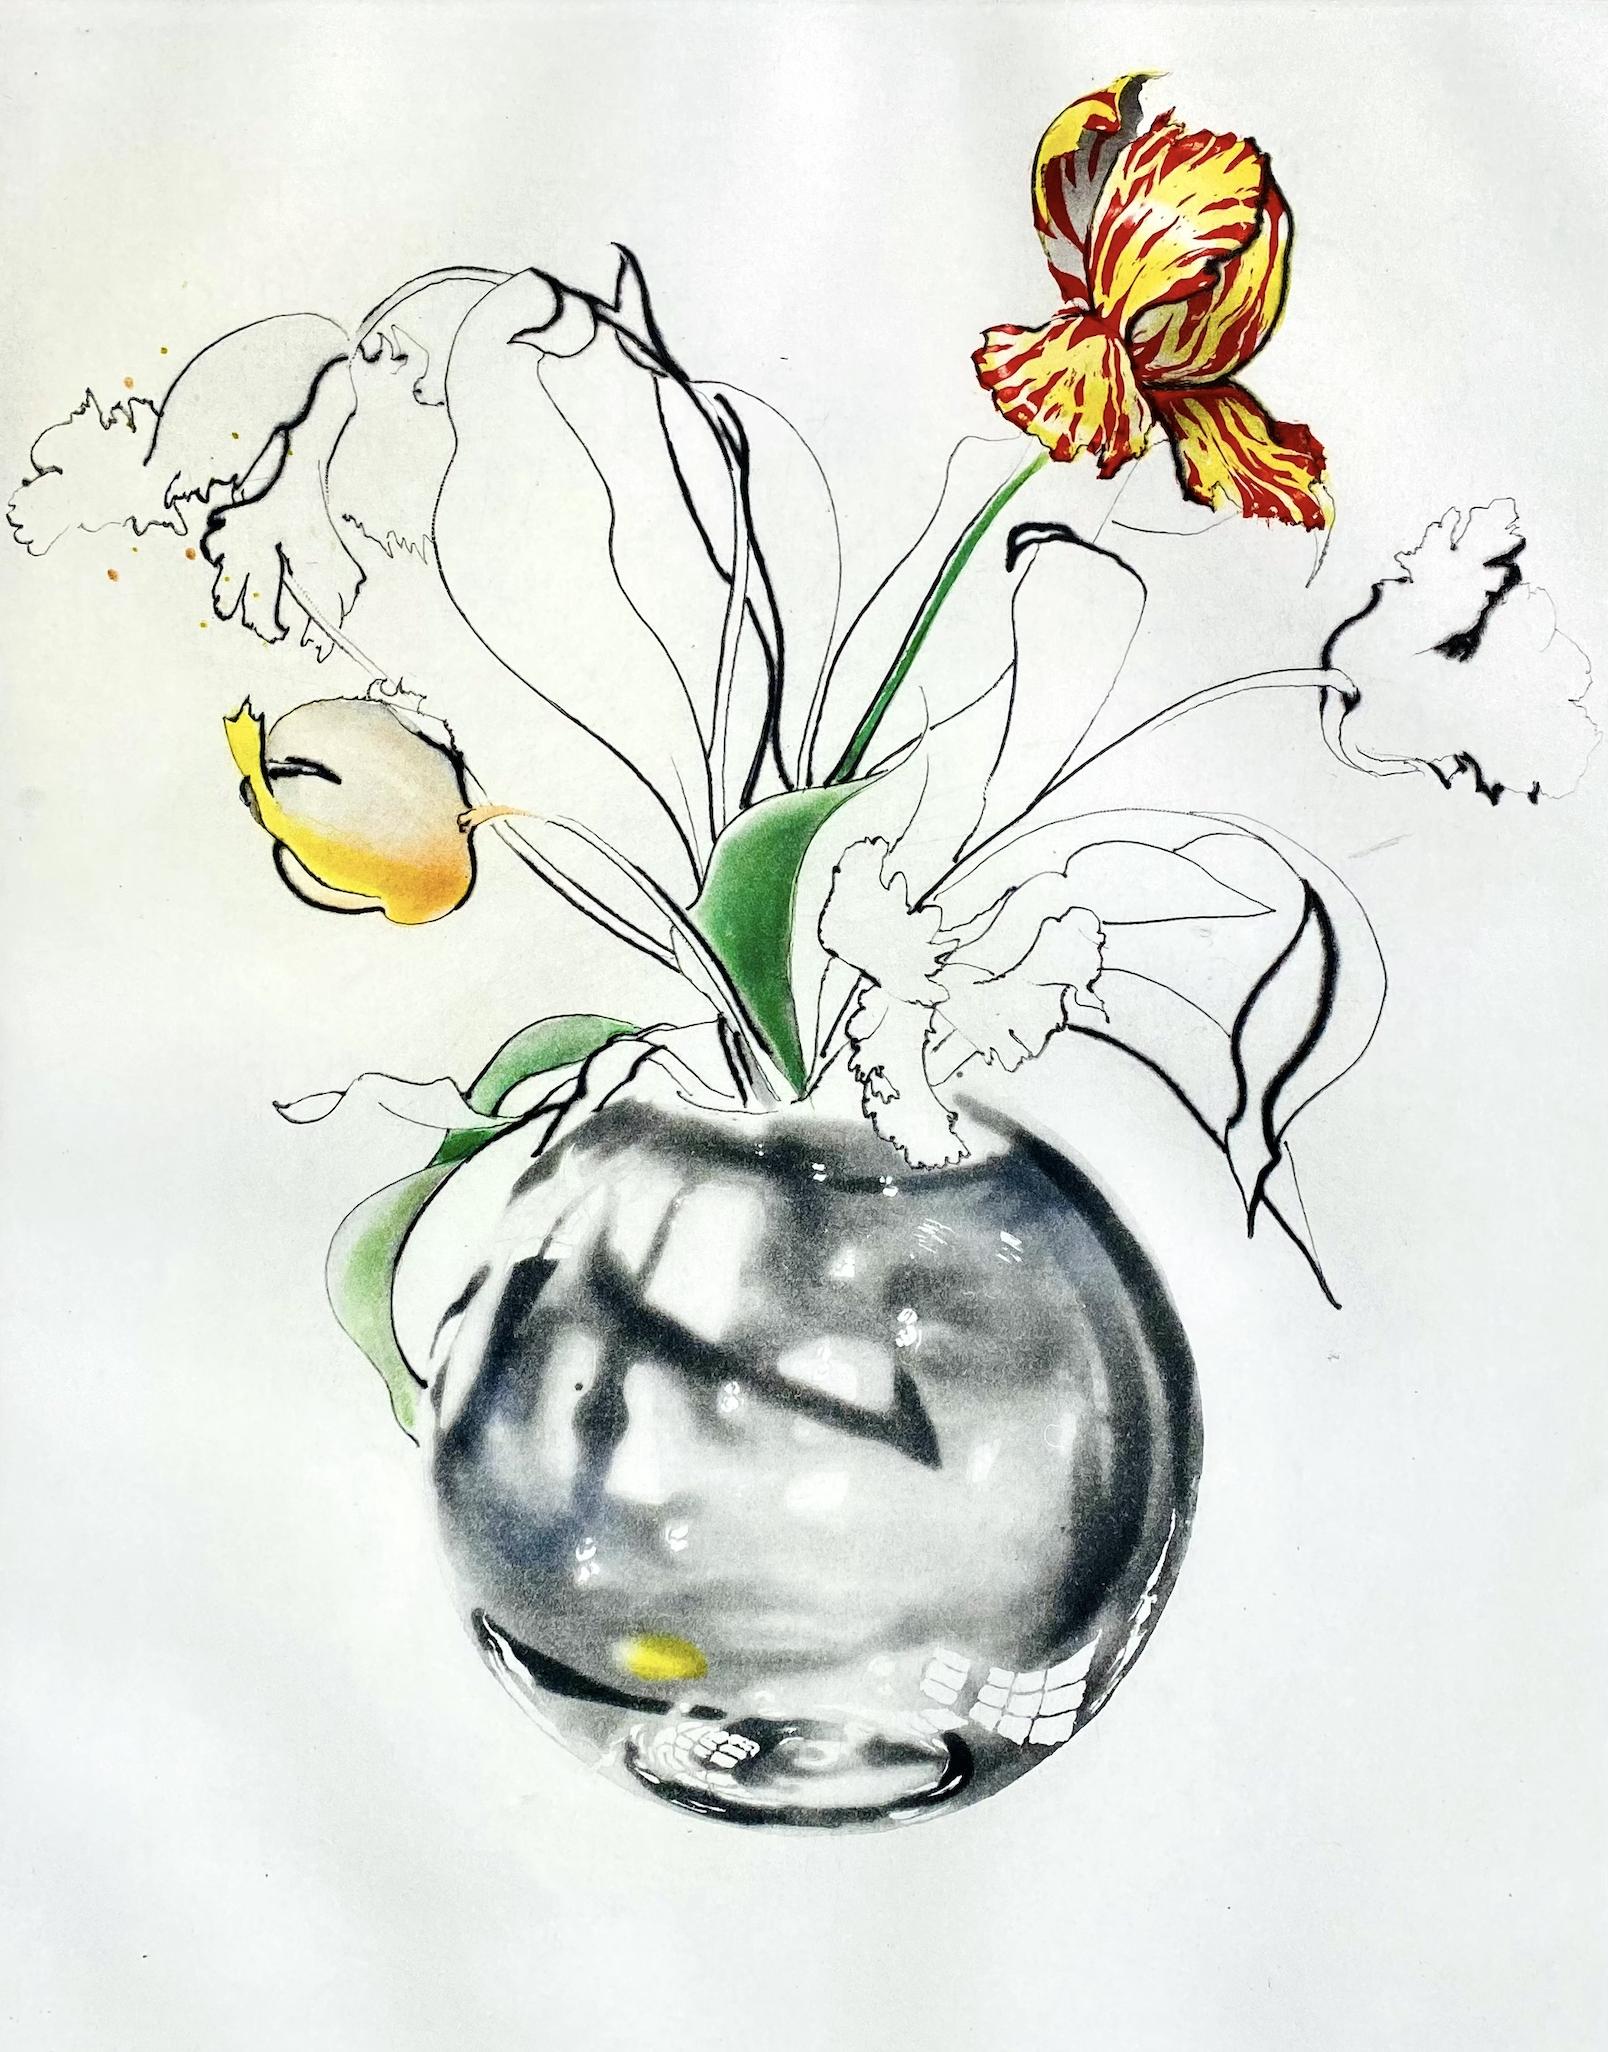 Joseph Goldyne Crystal, Water and Tulips (Hide and Seek)